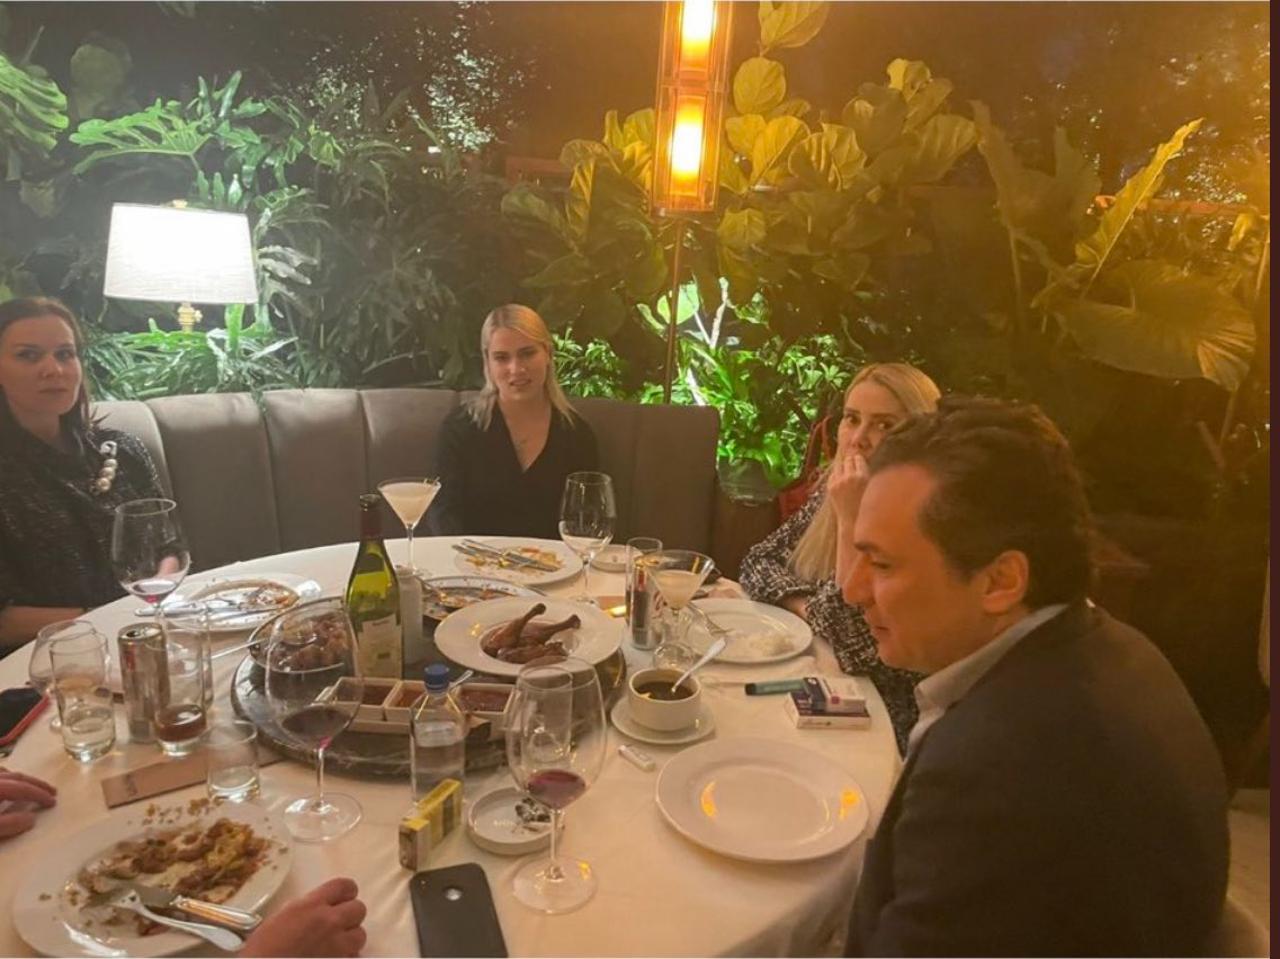 La cena de Emilio Lozoya causa 'agruras' al gobierno de AMLO